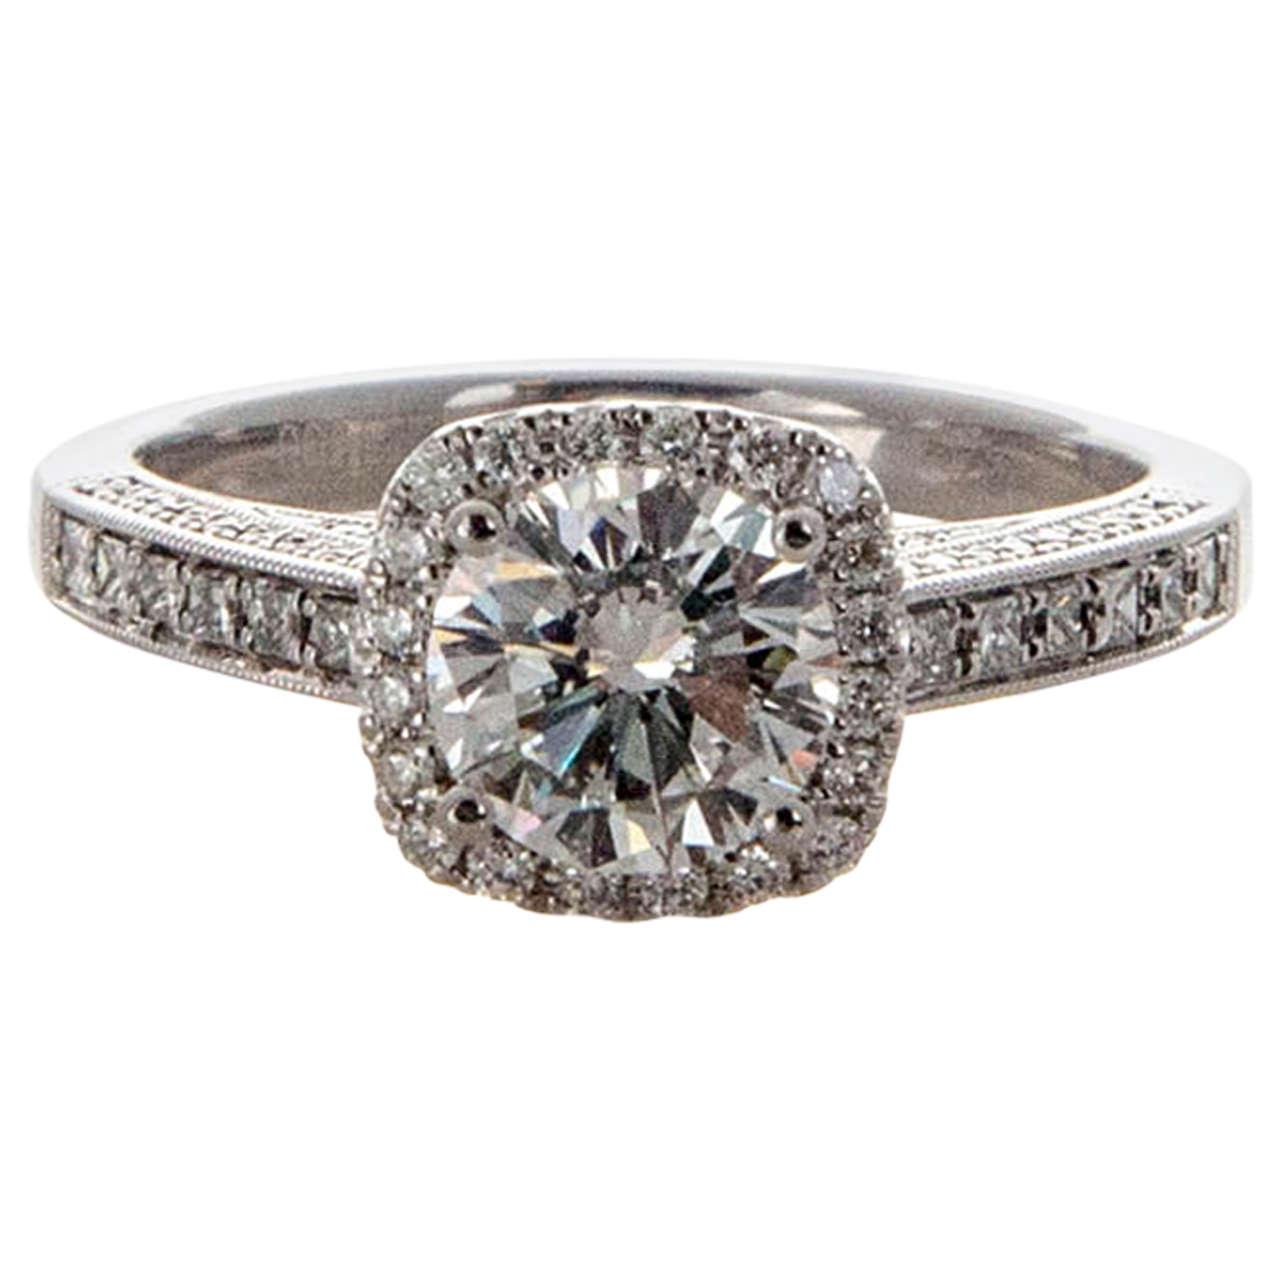 Diamond Rings For Sale Cheap: Sylvie Cushion Halo Diamond Platinum Ring For Sale At 1stdibs